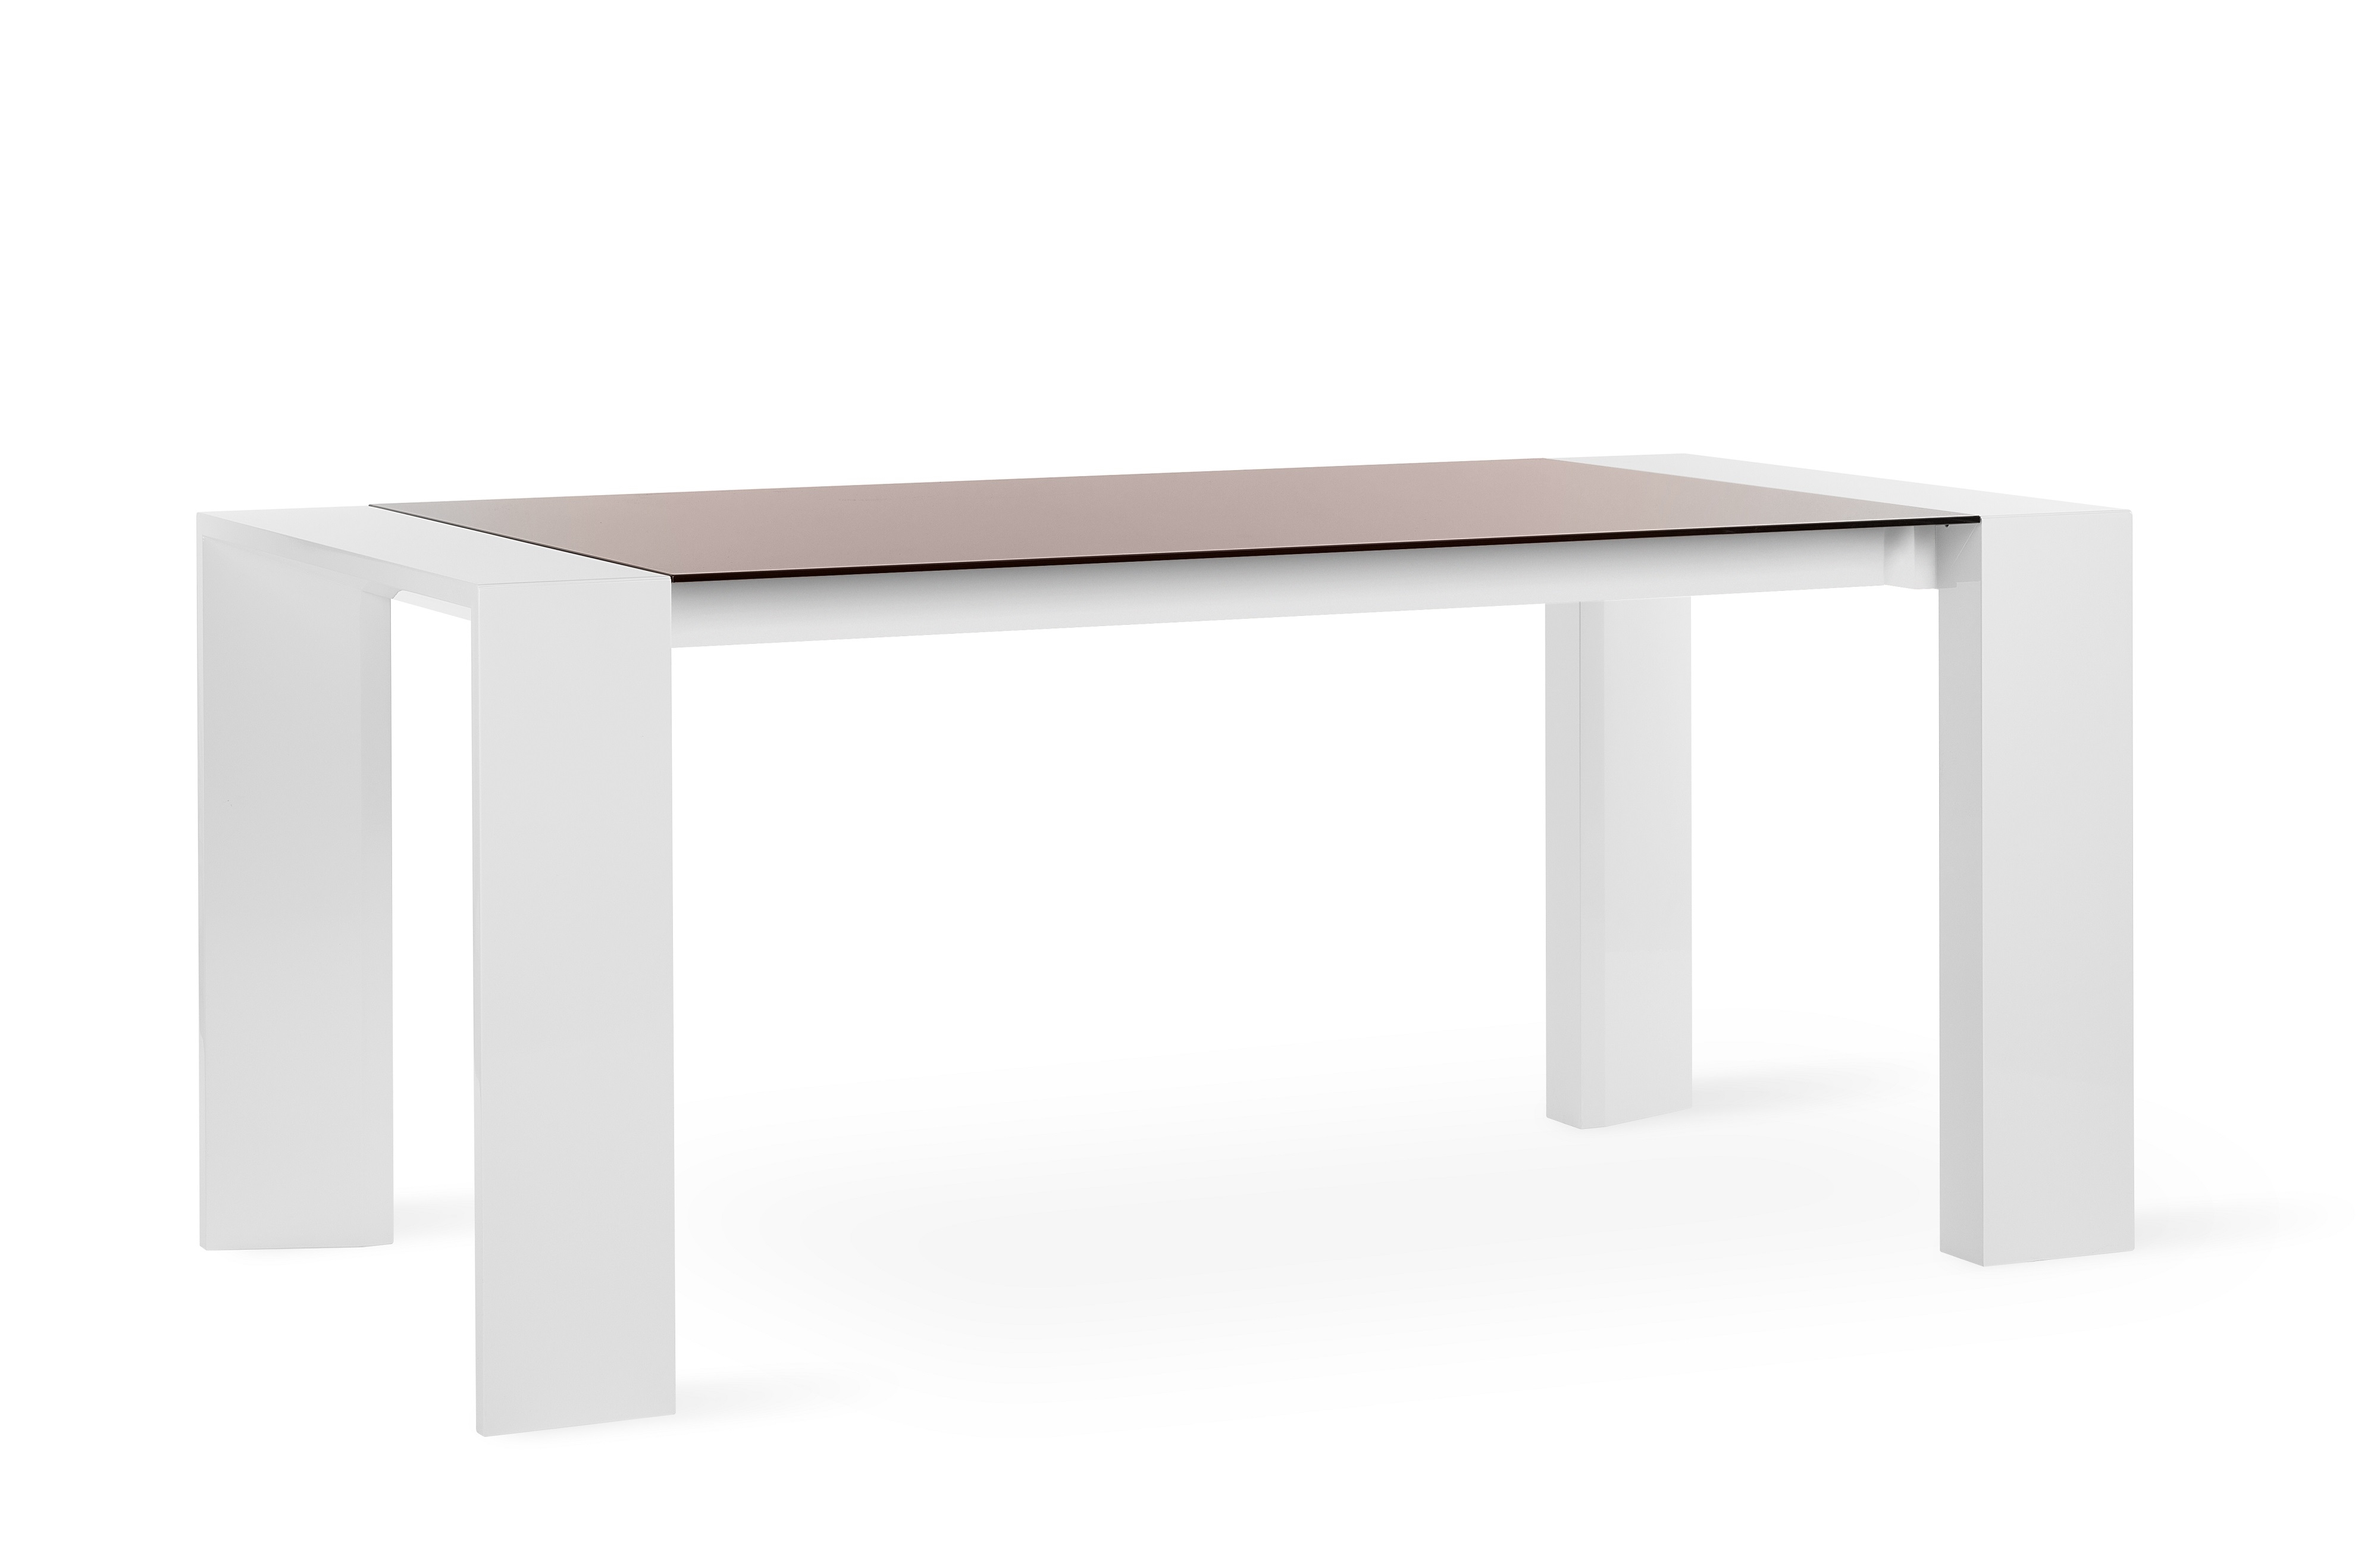 Tavolini ikea prezzi latest download by tablet desktop for Ikea tavolini da esterno